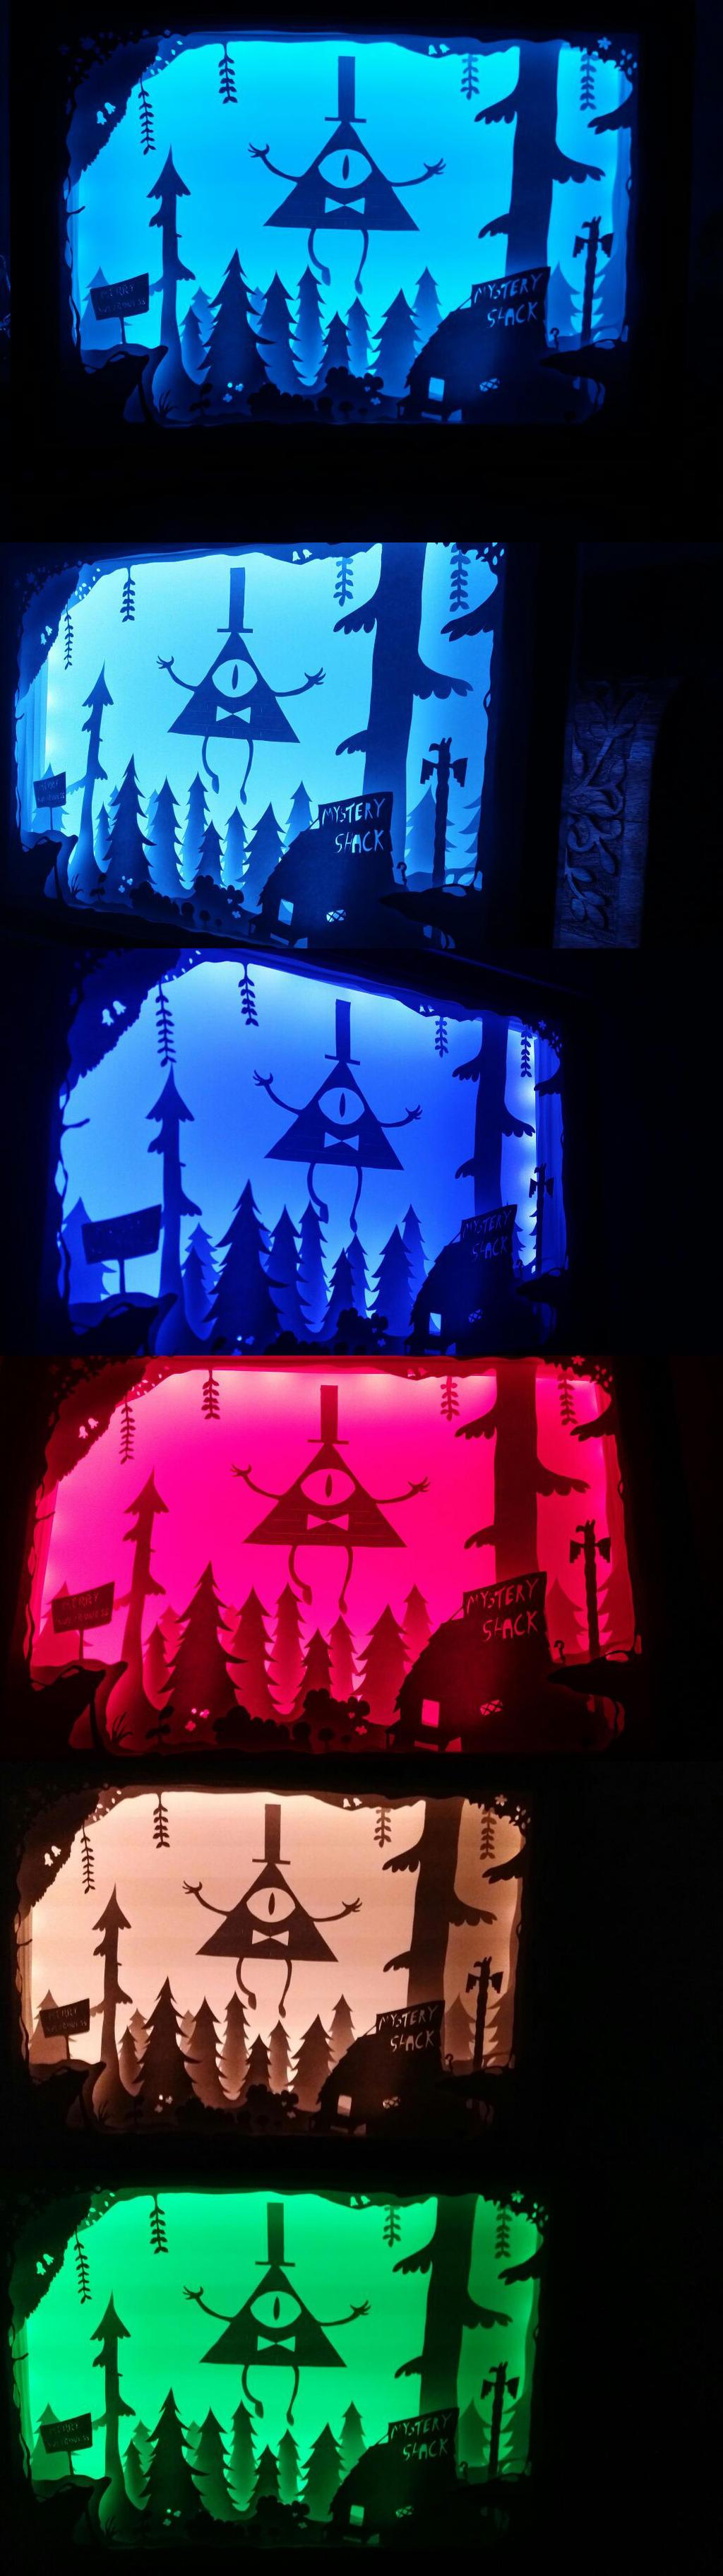 3D diorama lightbox (Bill Cipher) by das-chu